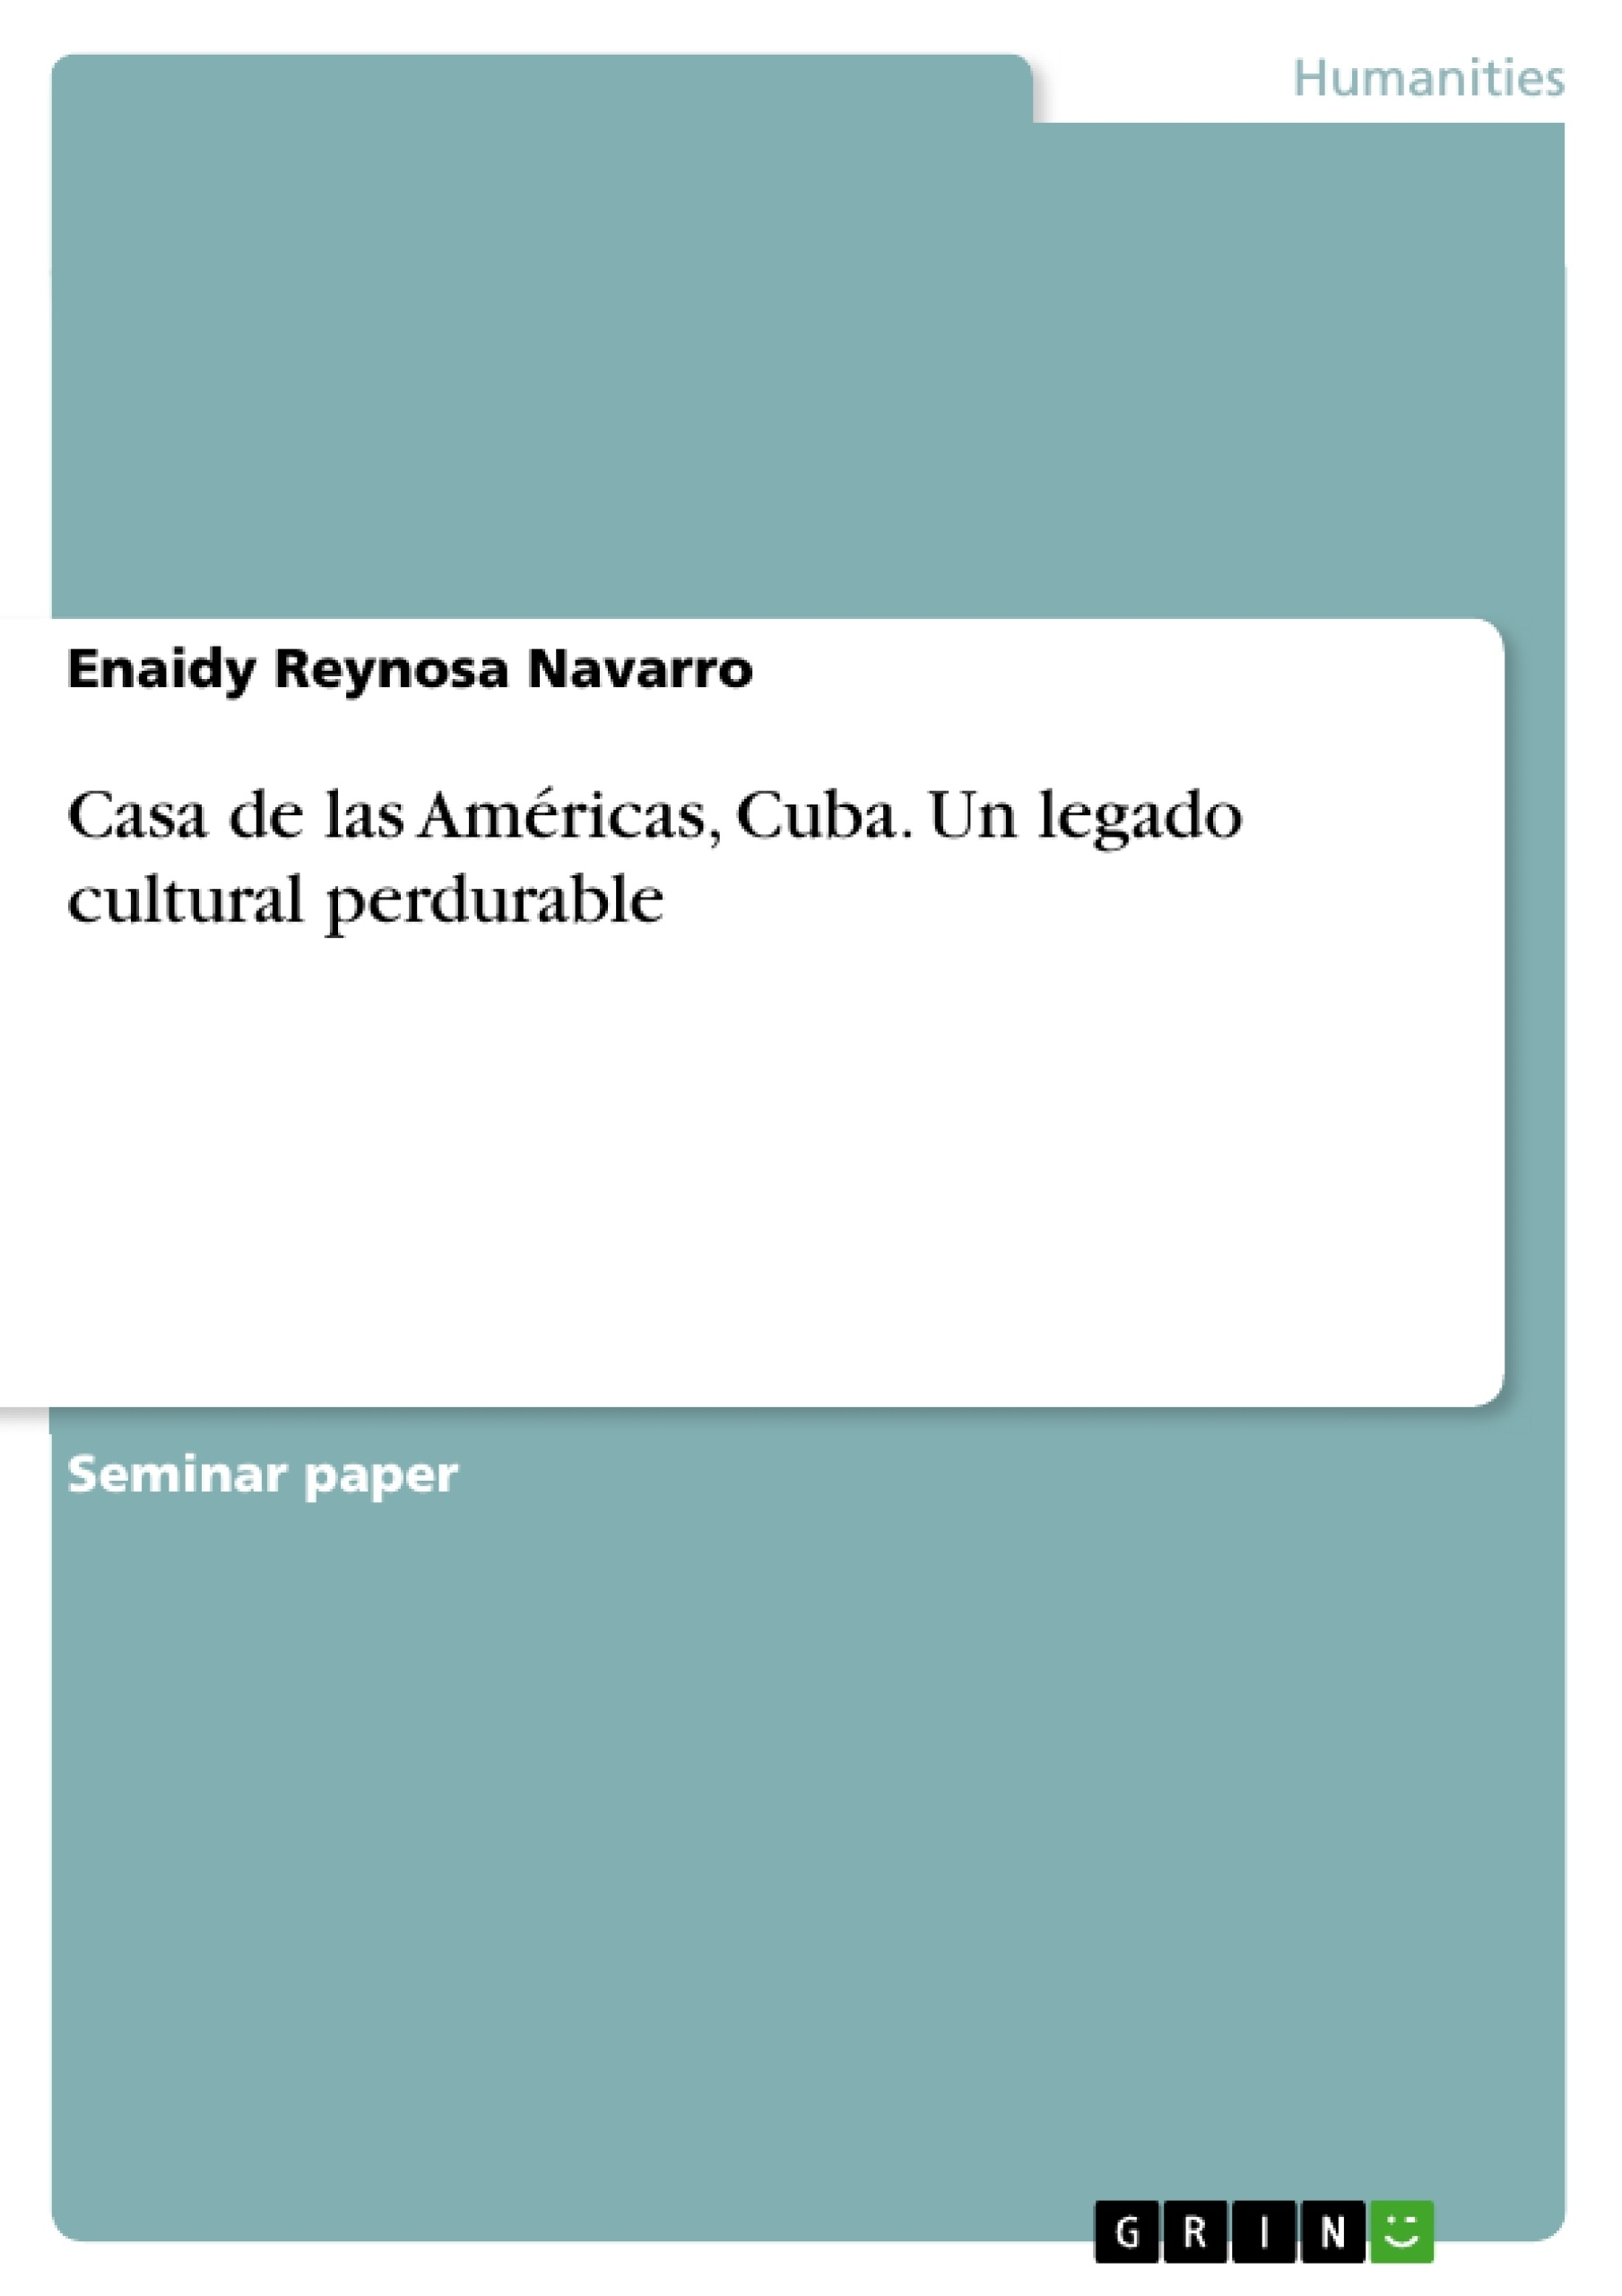 Título: Casa de las Américas, Cuba. Un legado cultural perdurable